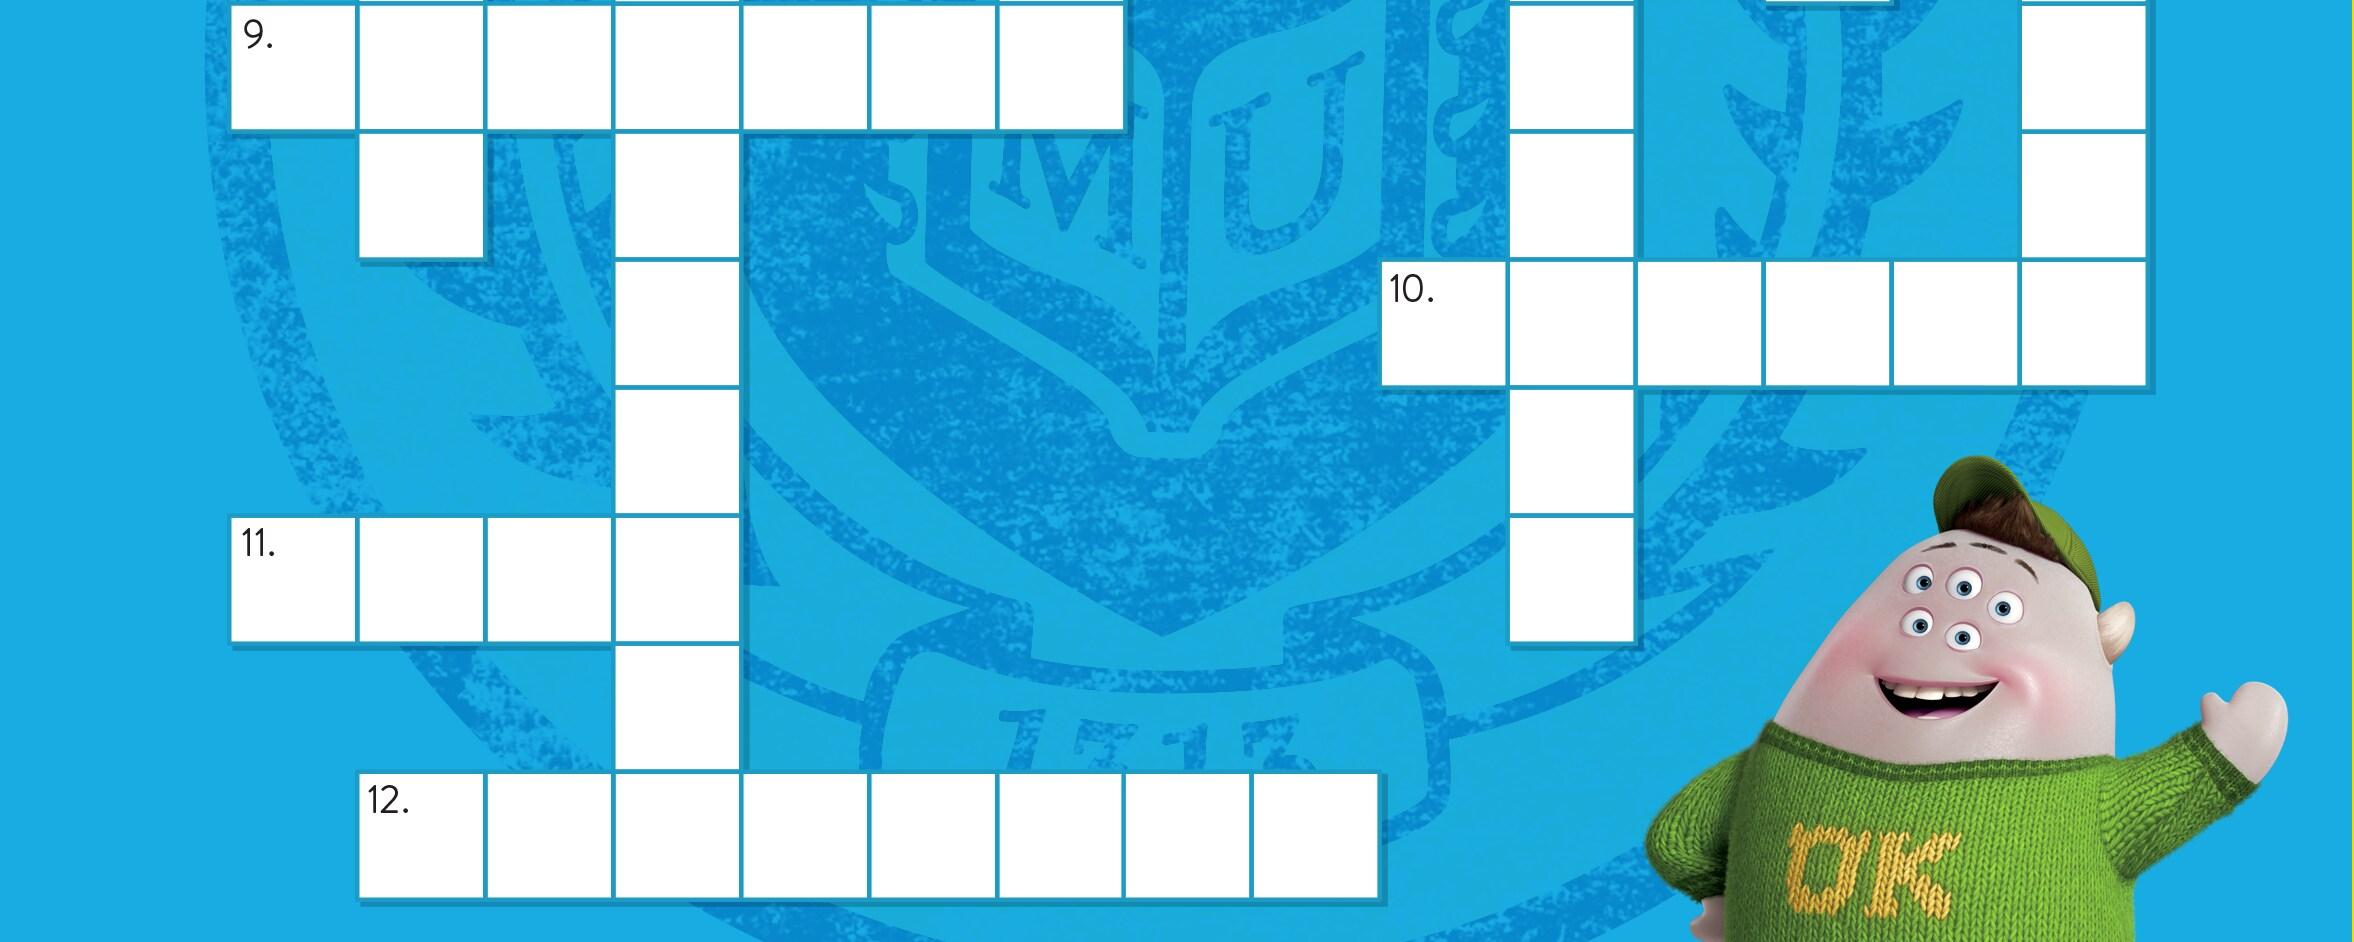 pixar crossword puzzle